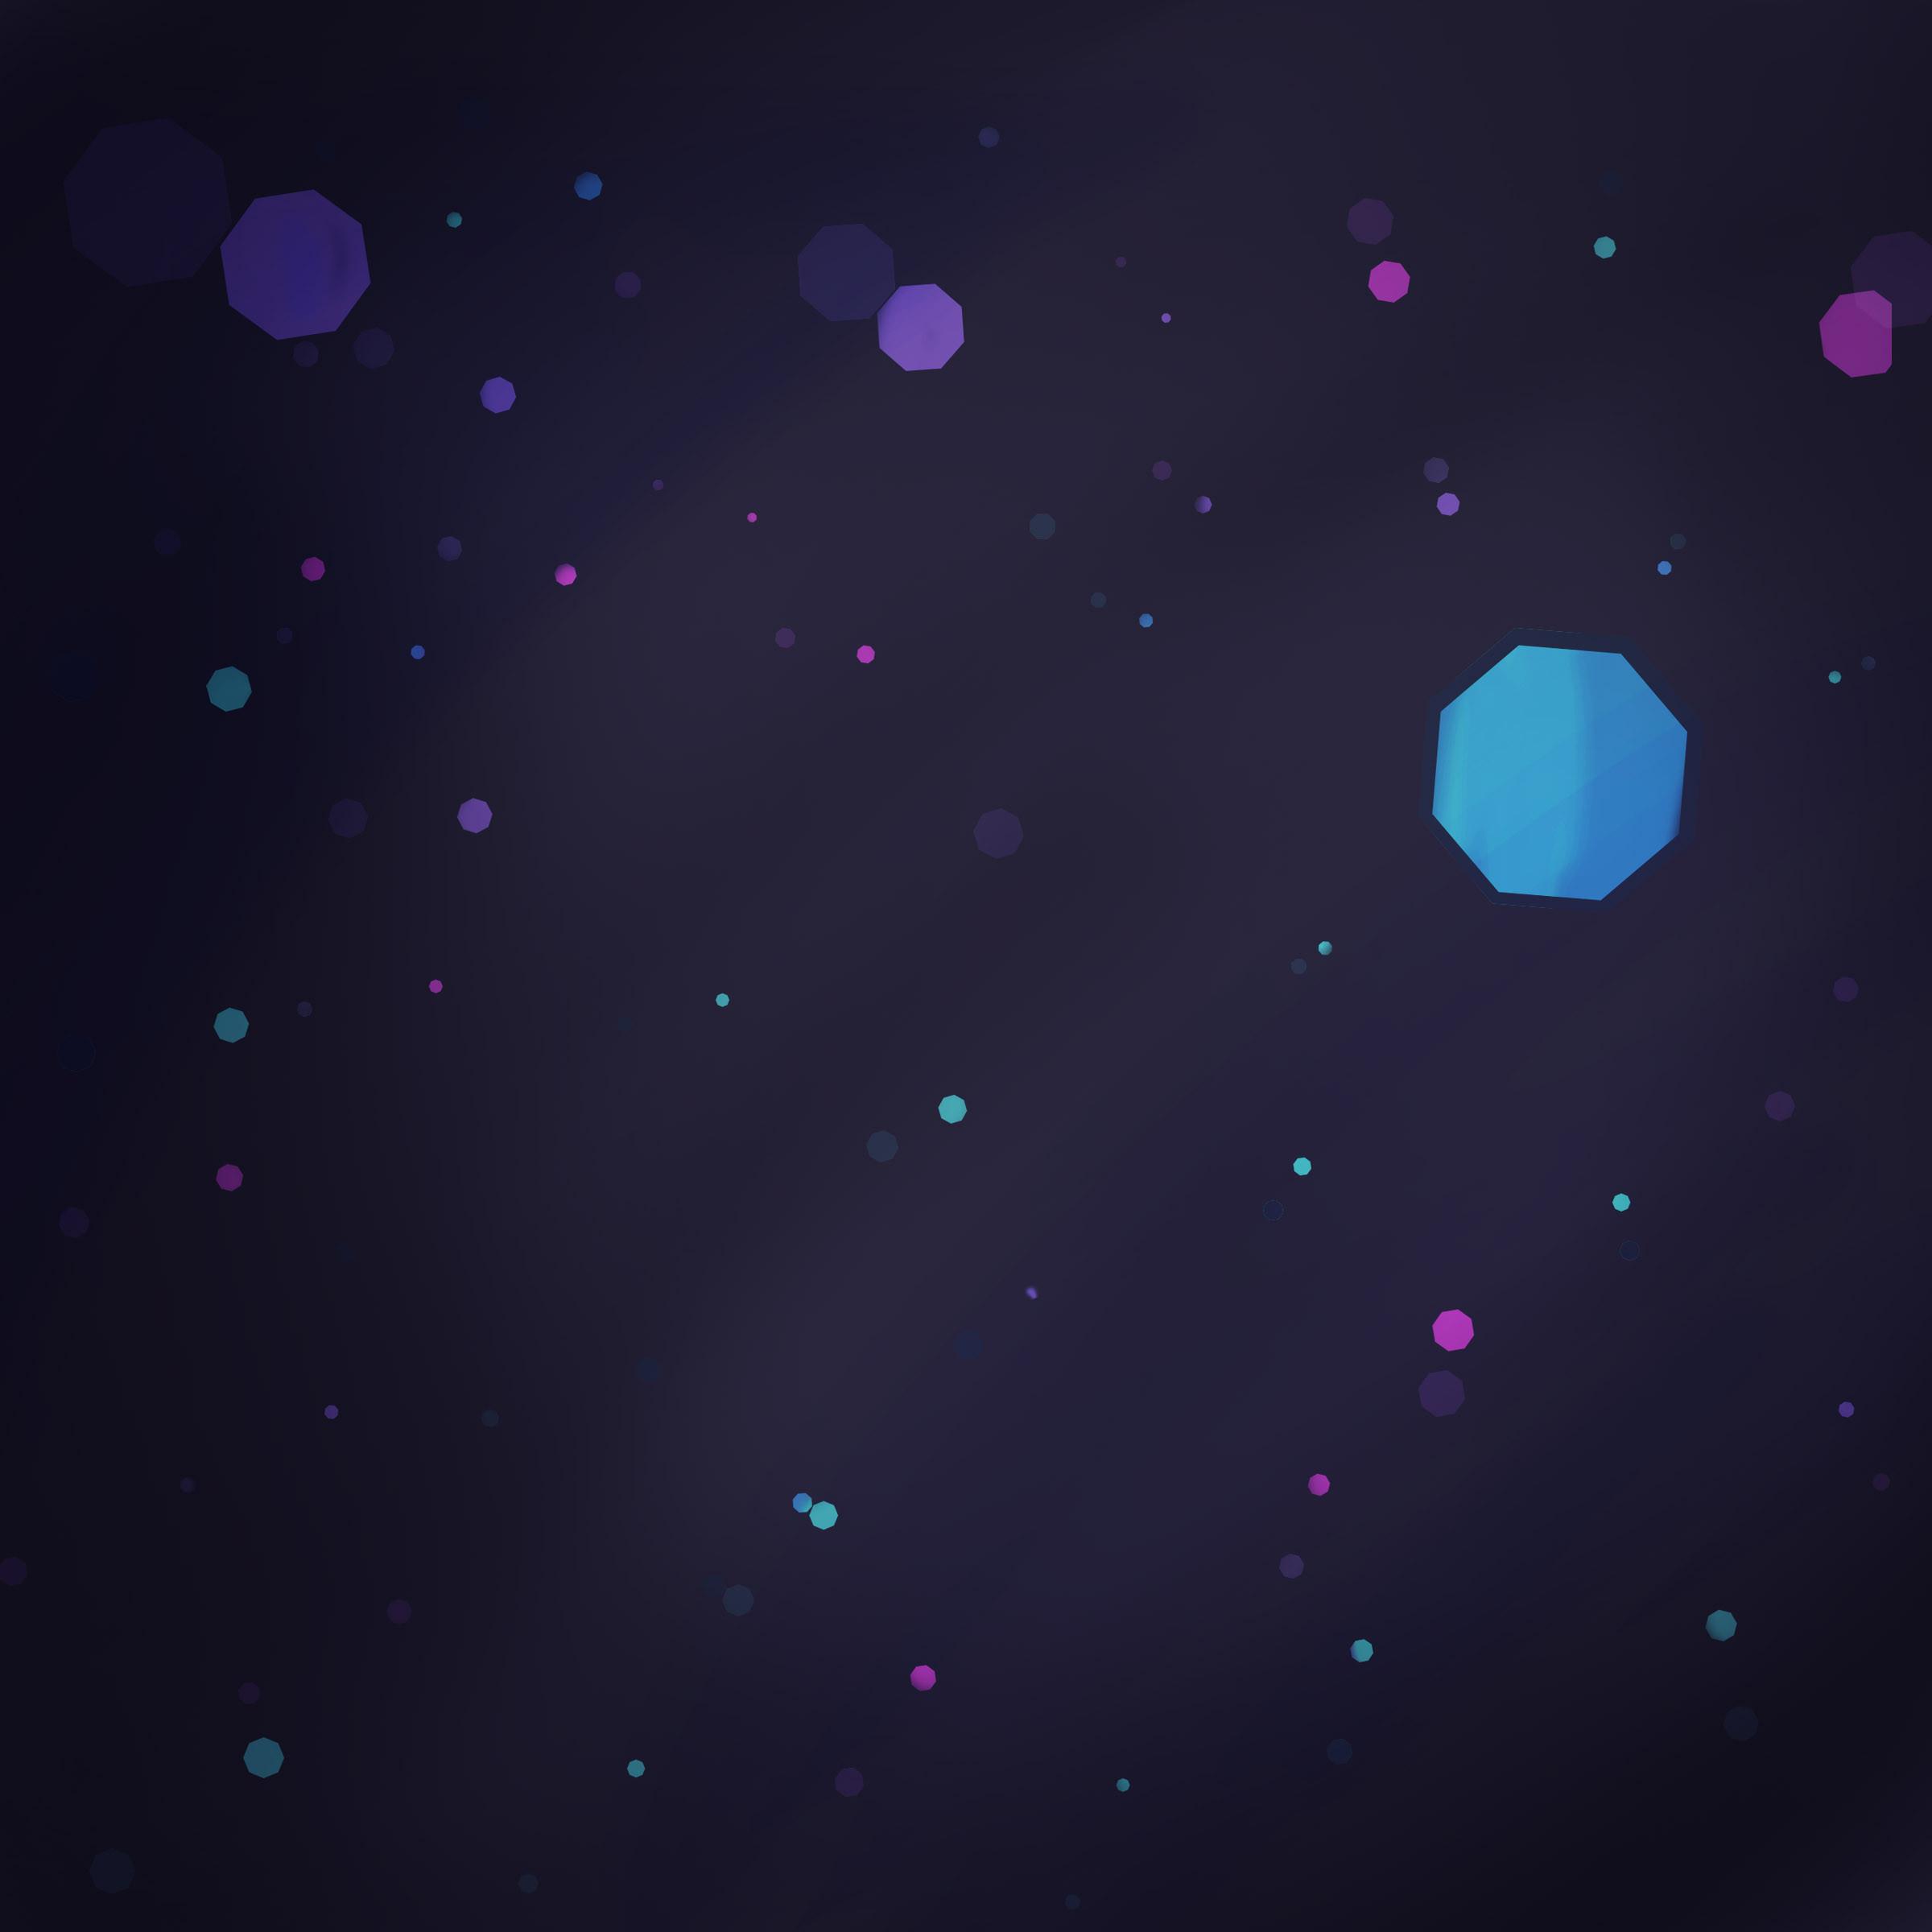 Star Study 1